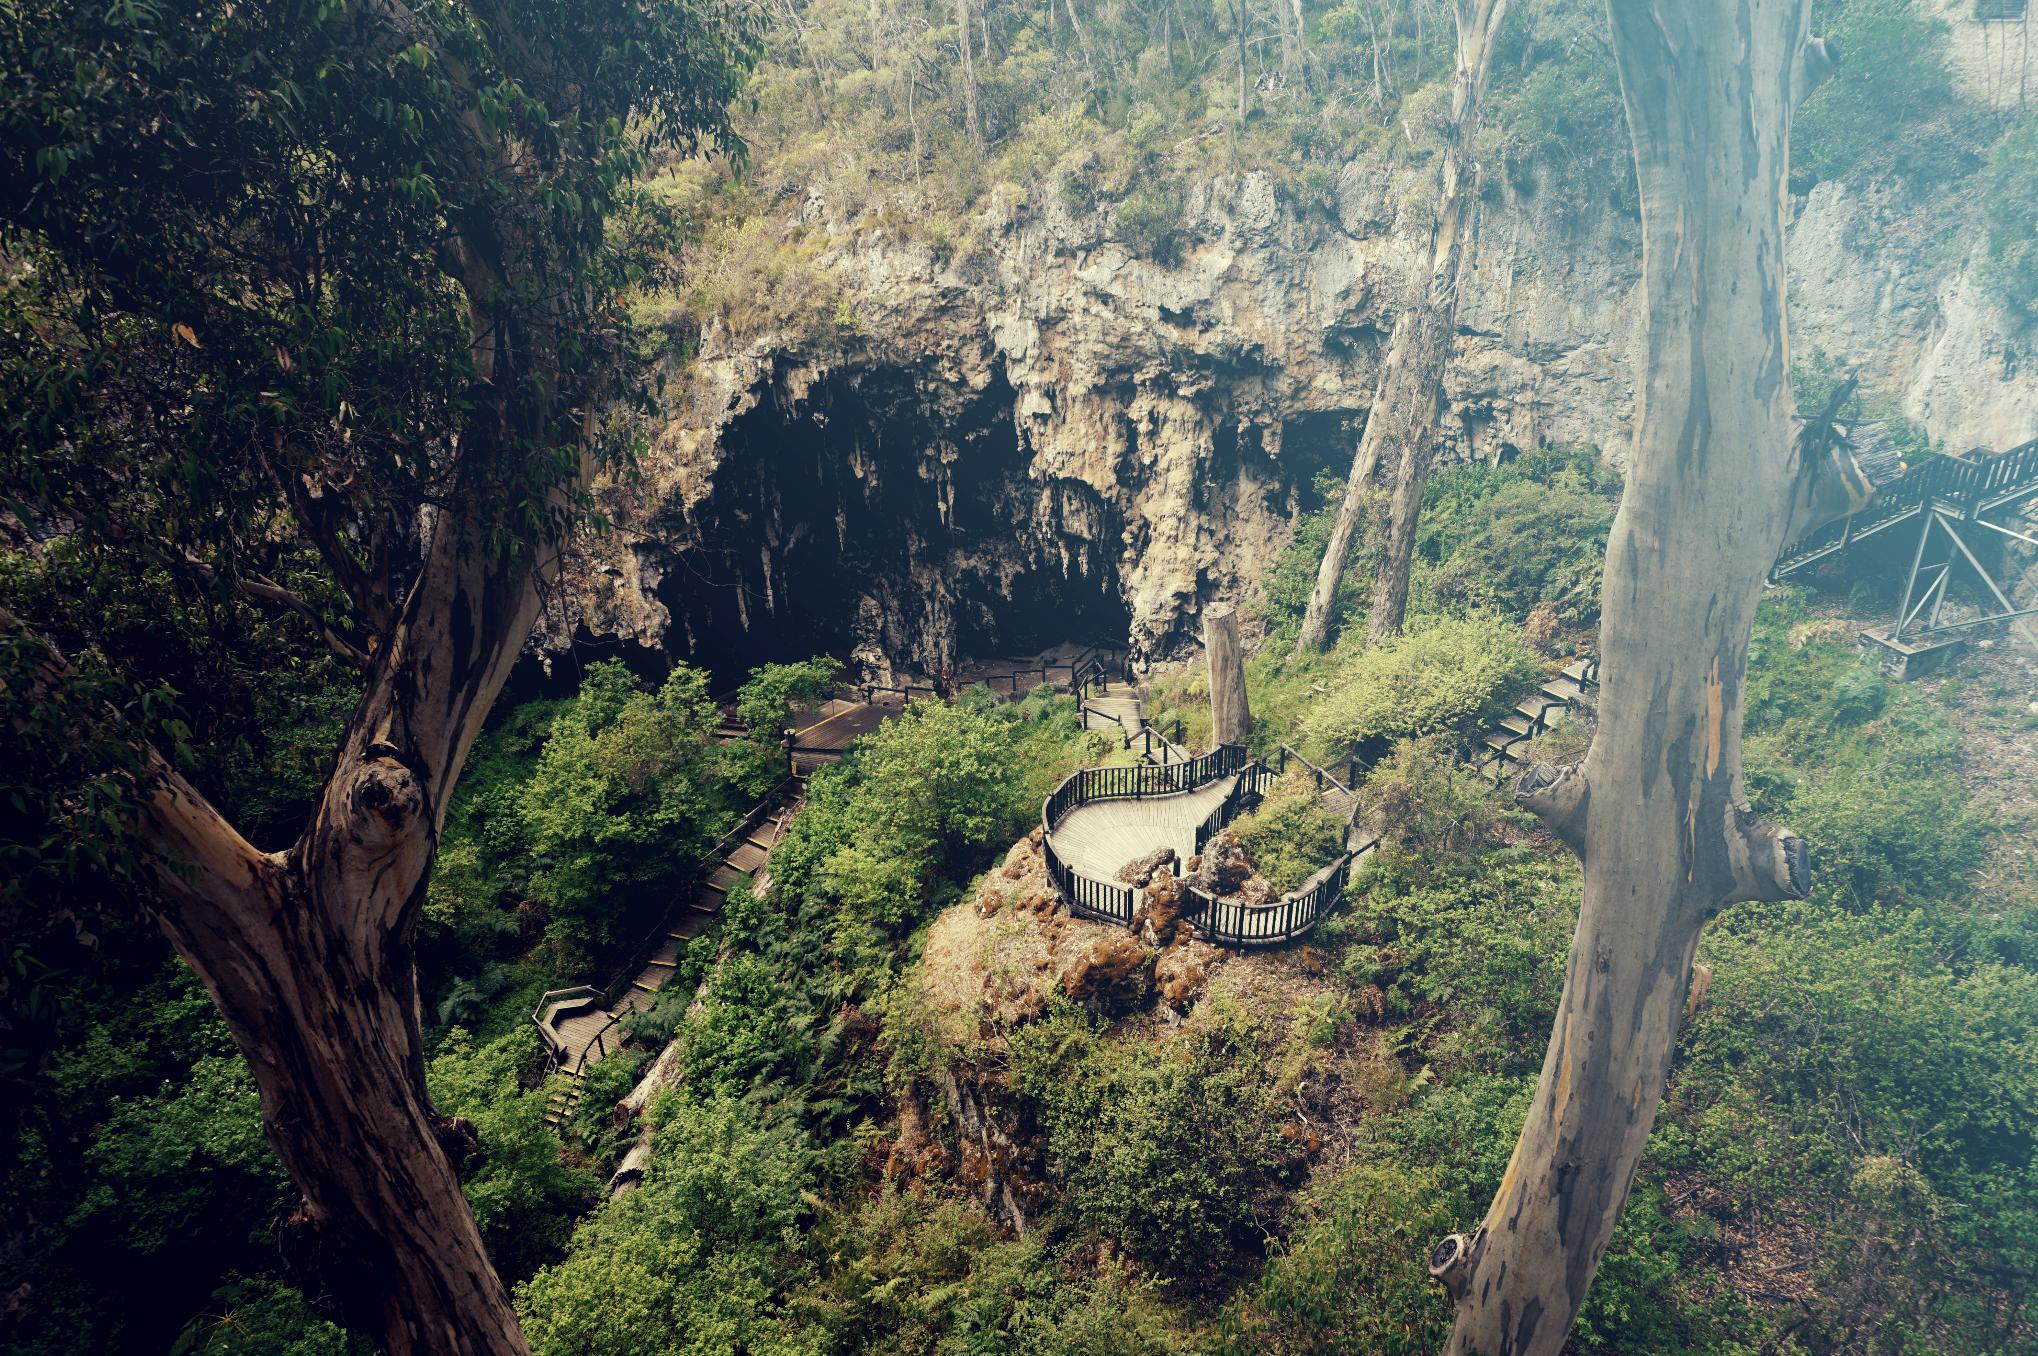 maybeyoulike_australie_Margaret_river_12